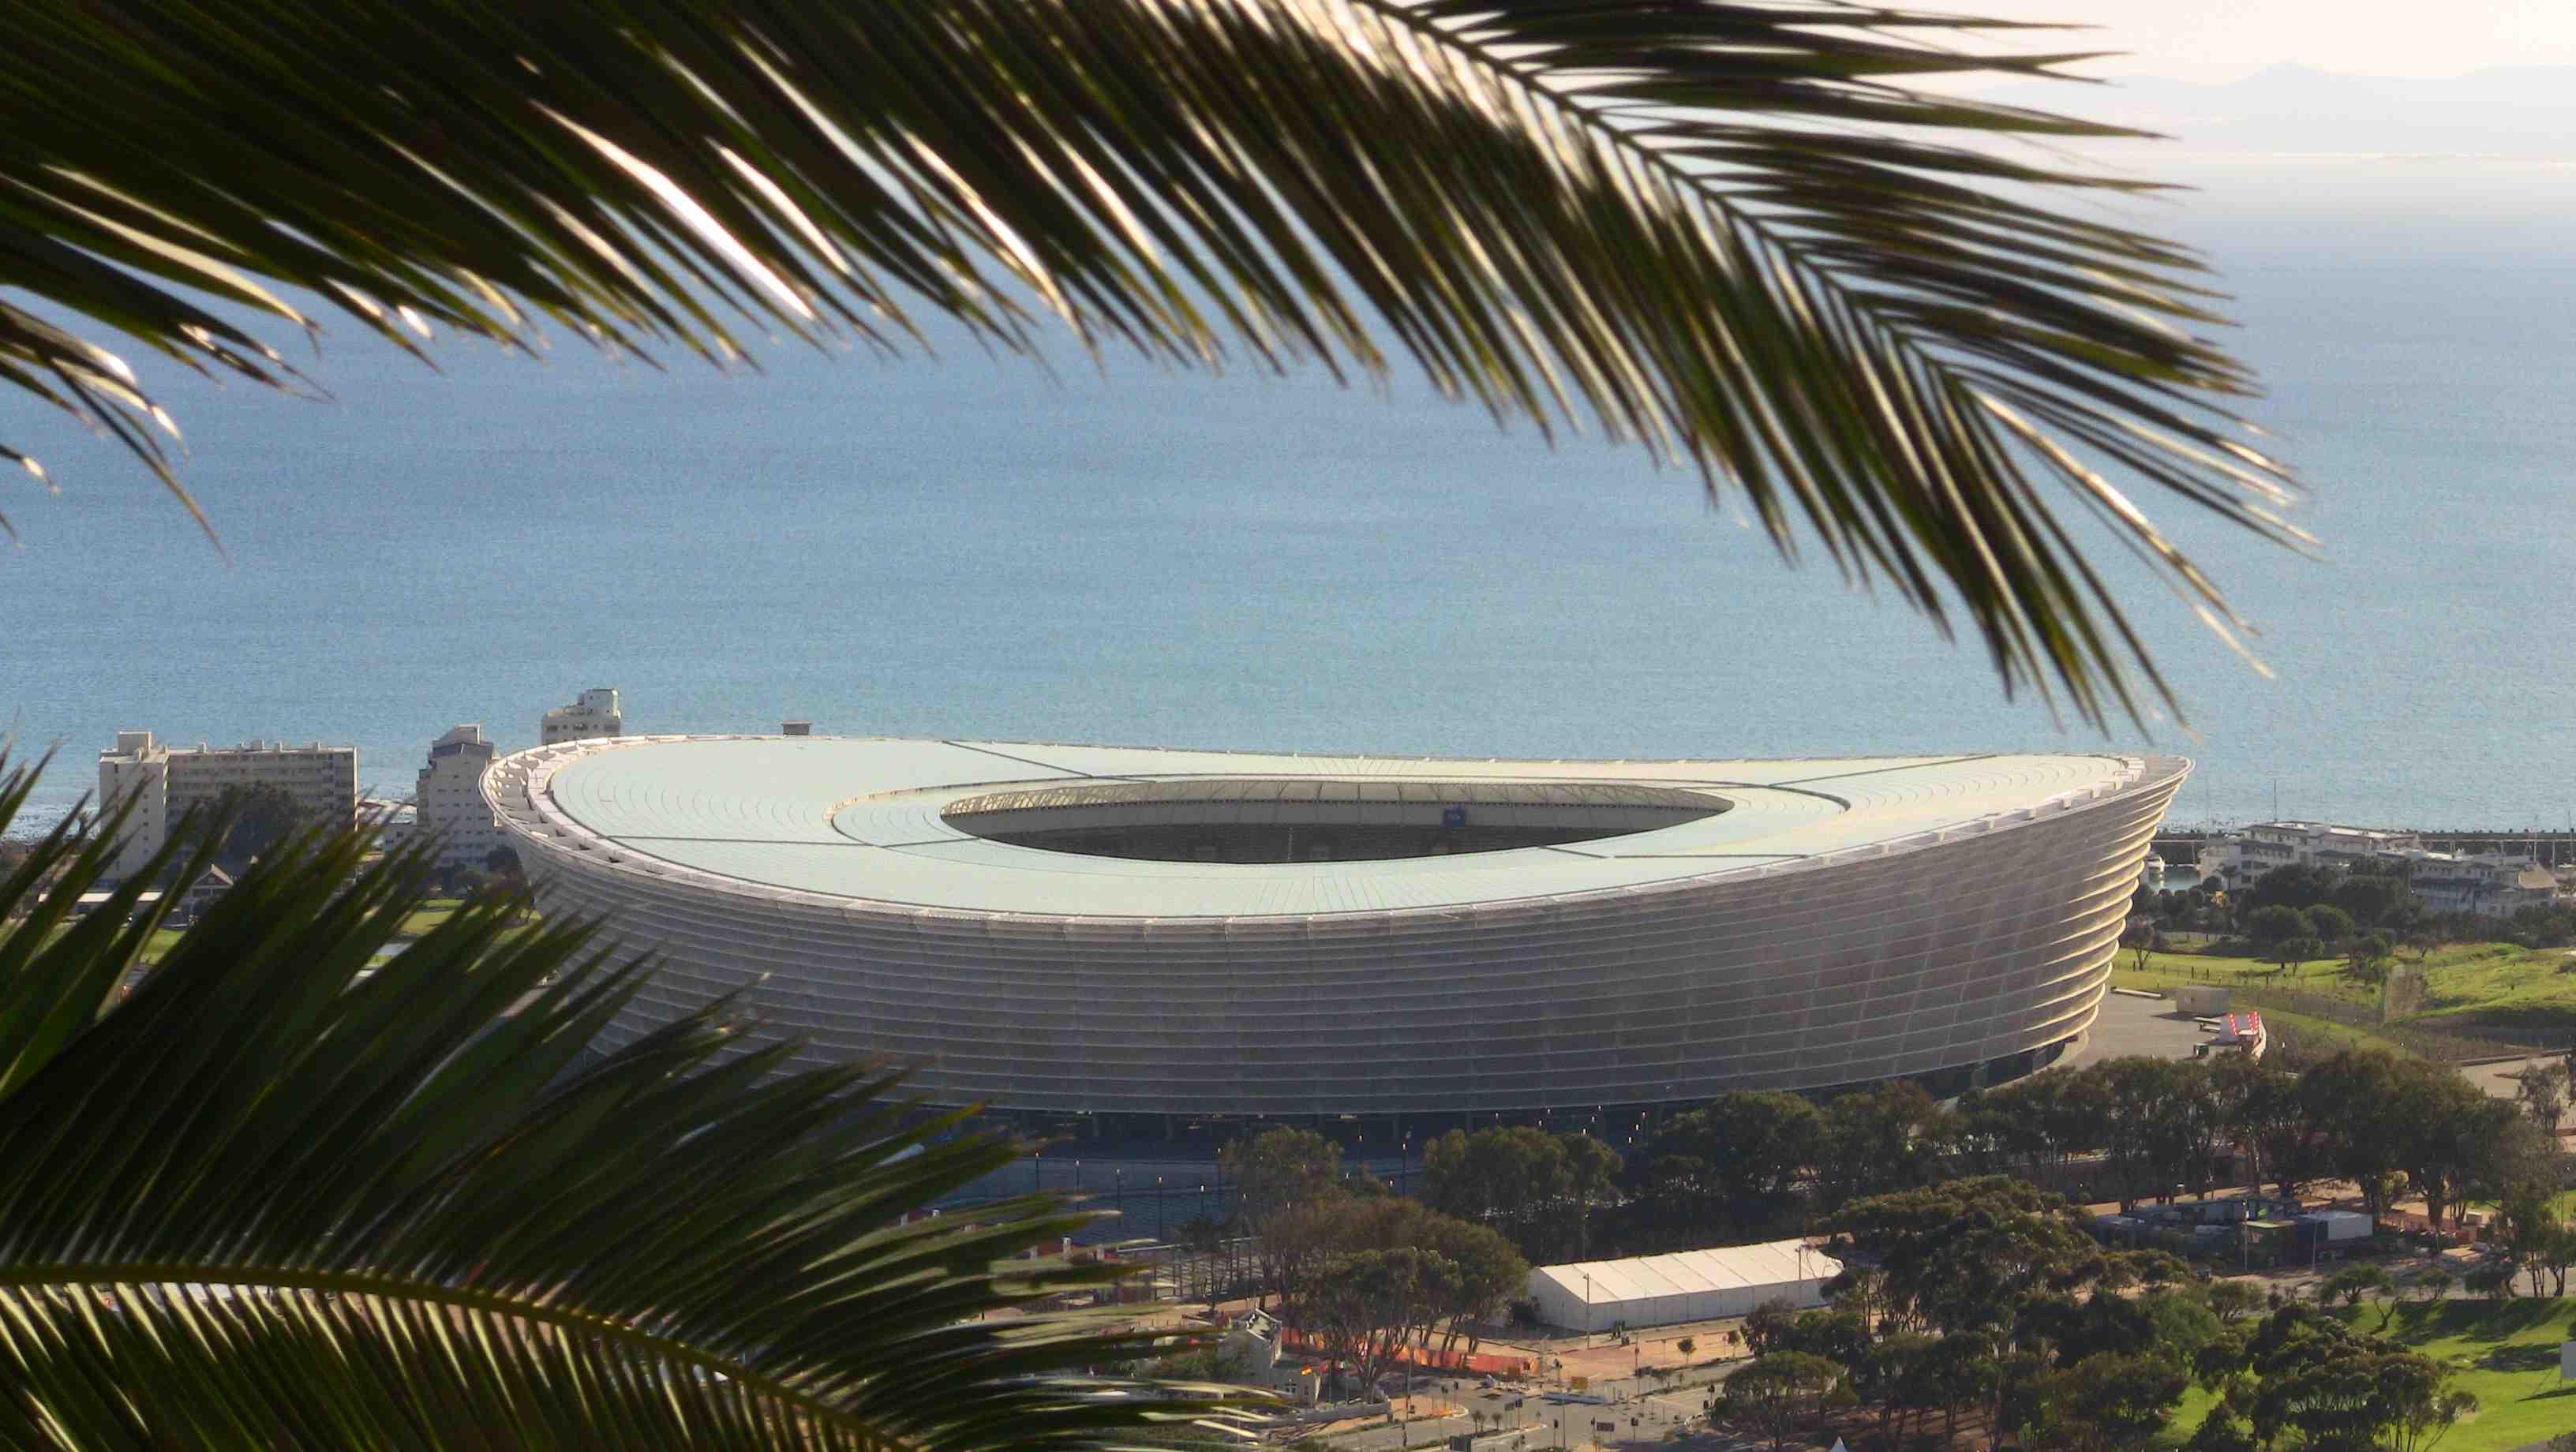 Stadium_byWil.jpg